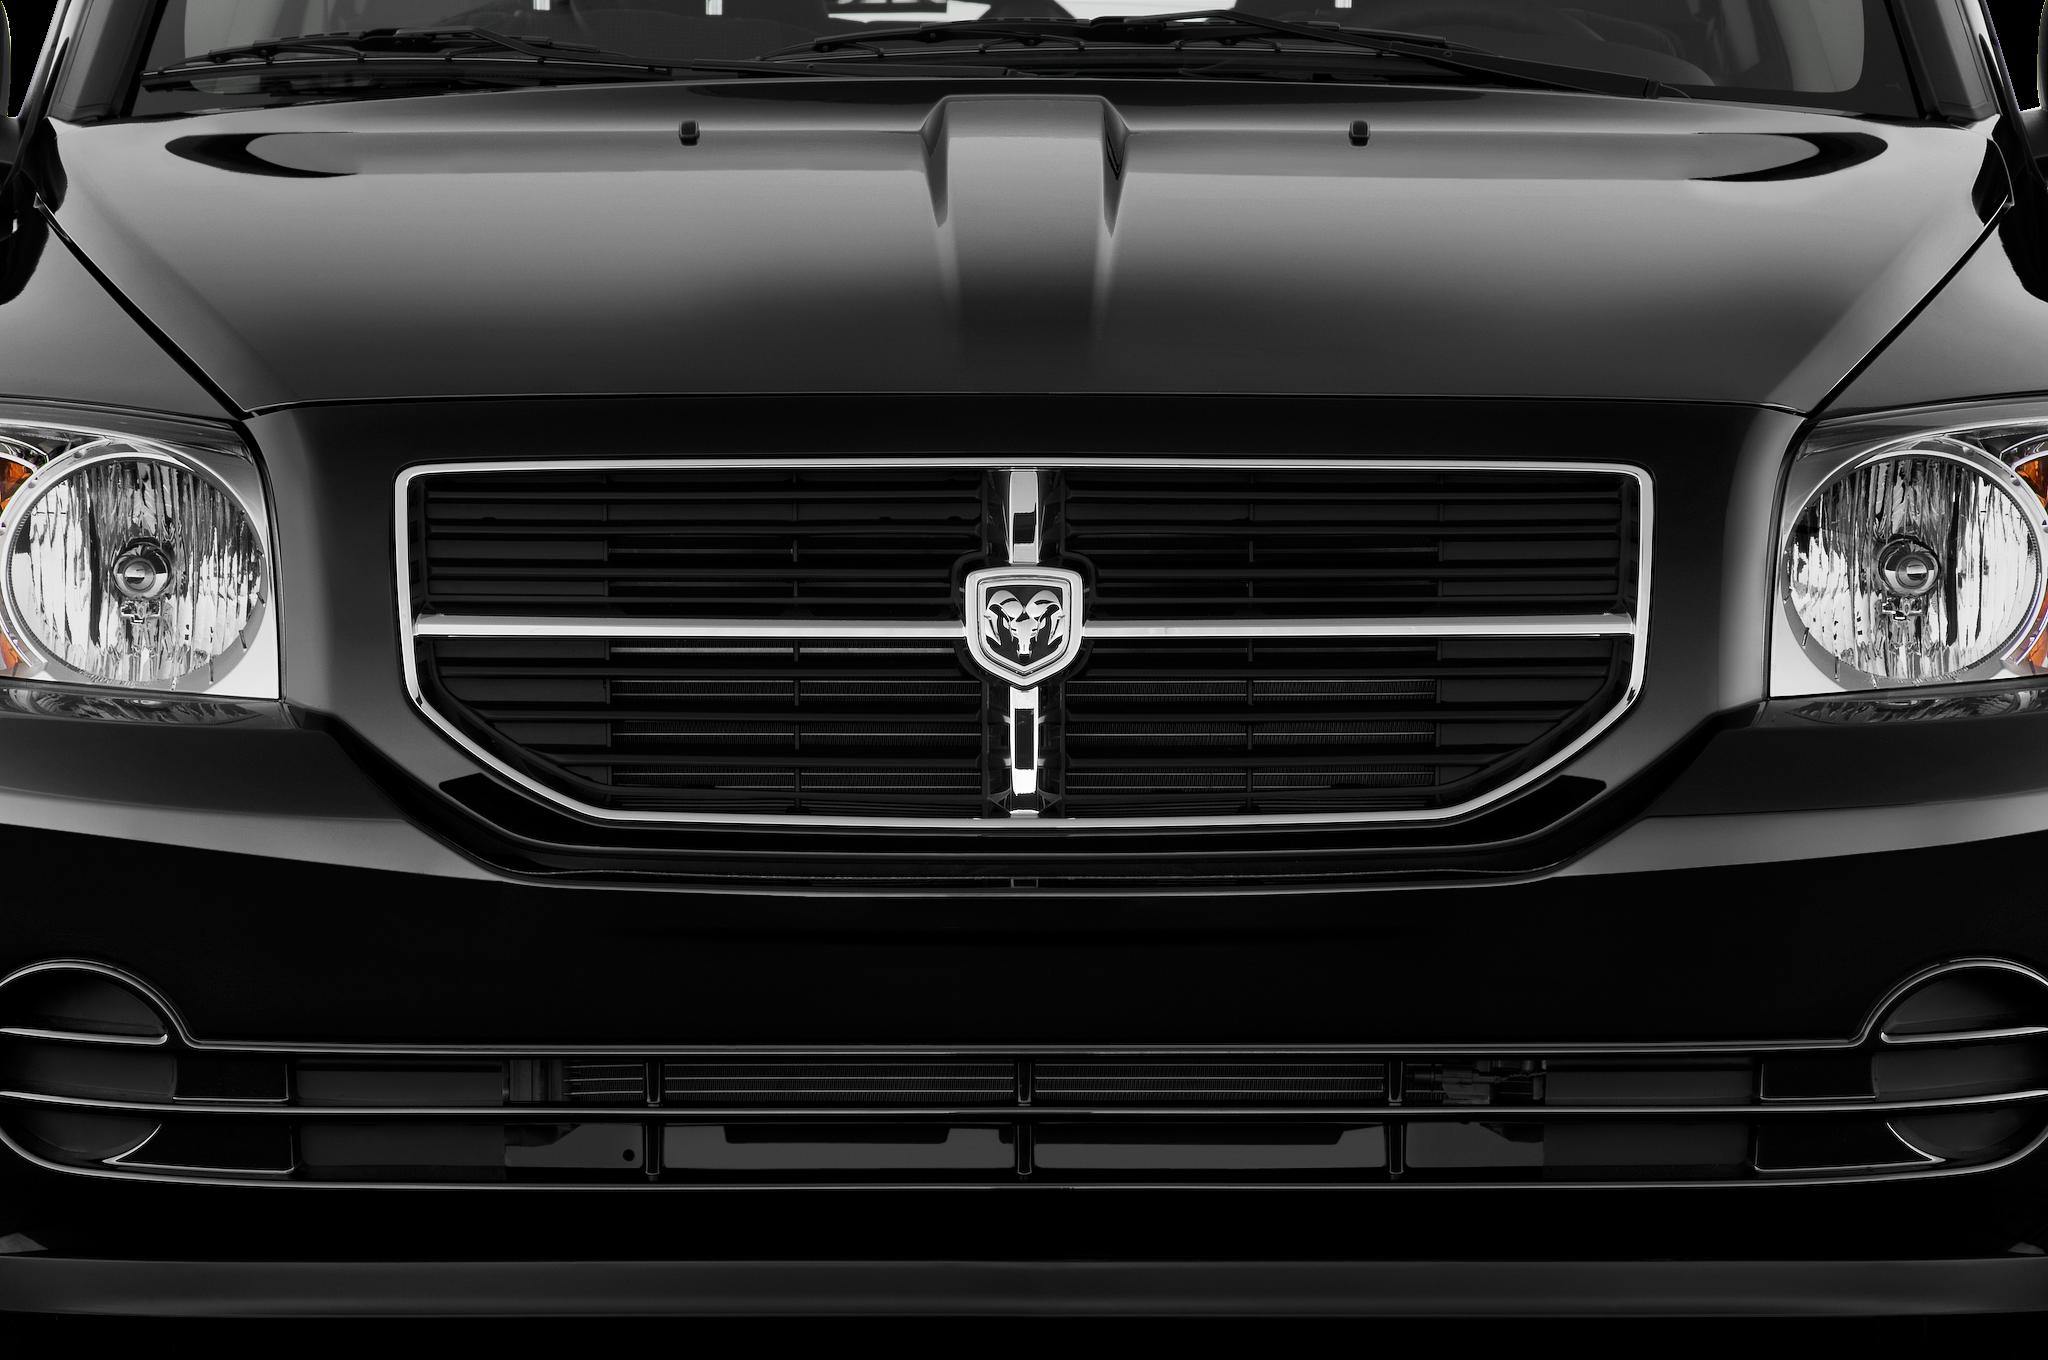 2010 Dodge Caliber Rush Editors Notebook Automobile Magazine Headlight Wiring 9 25